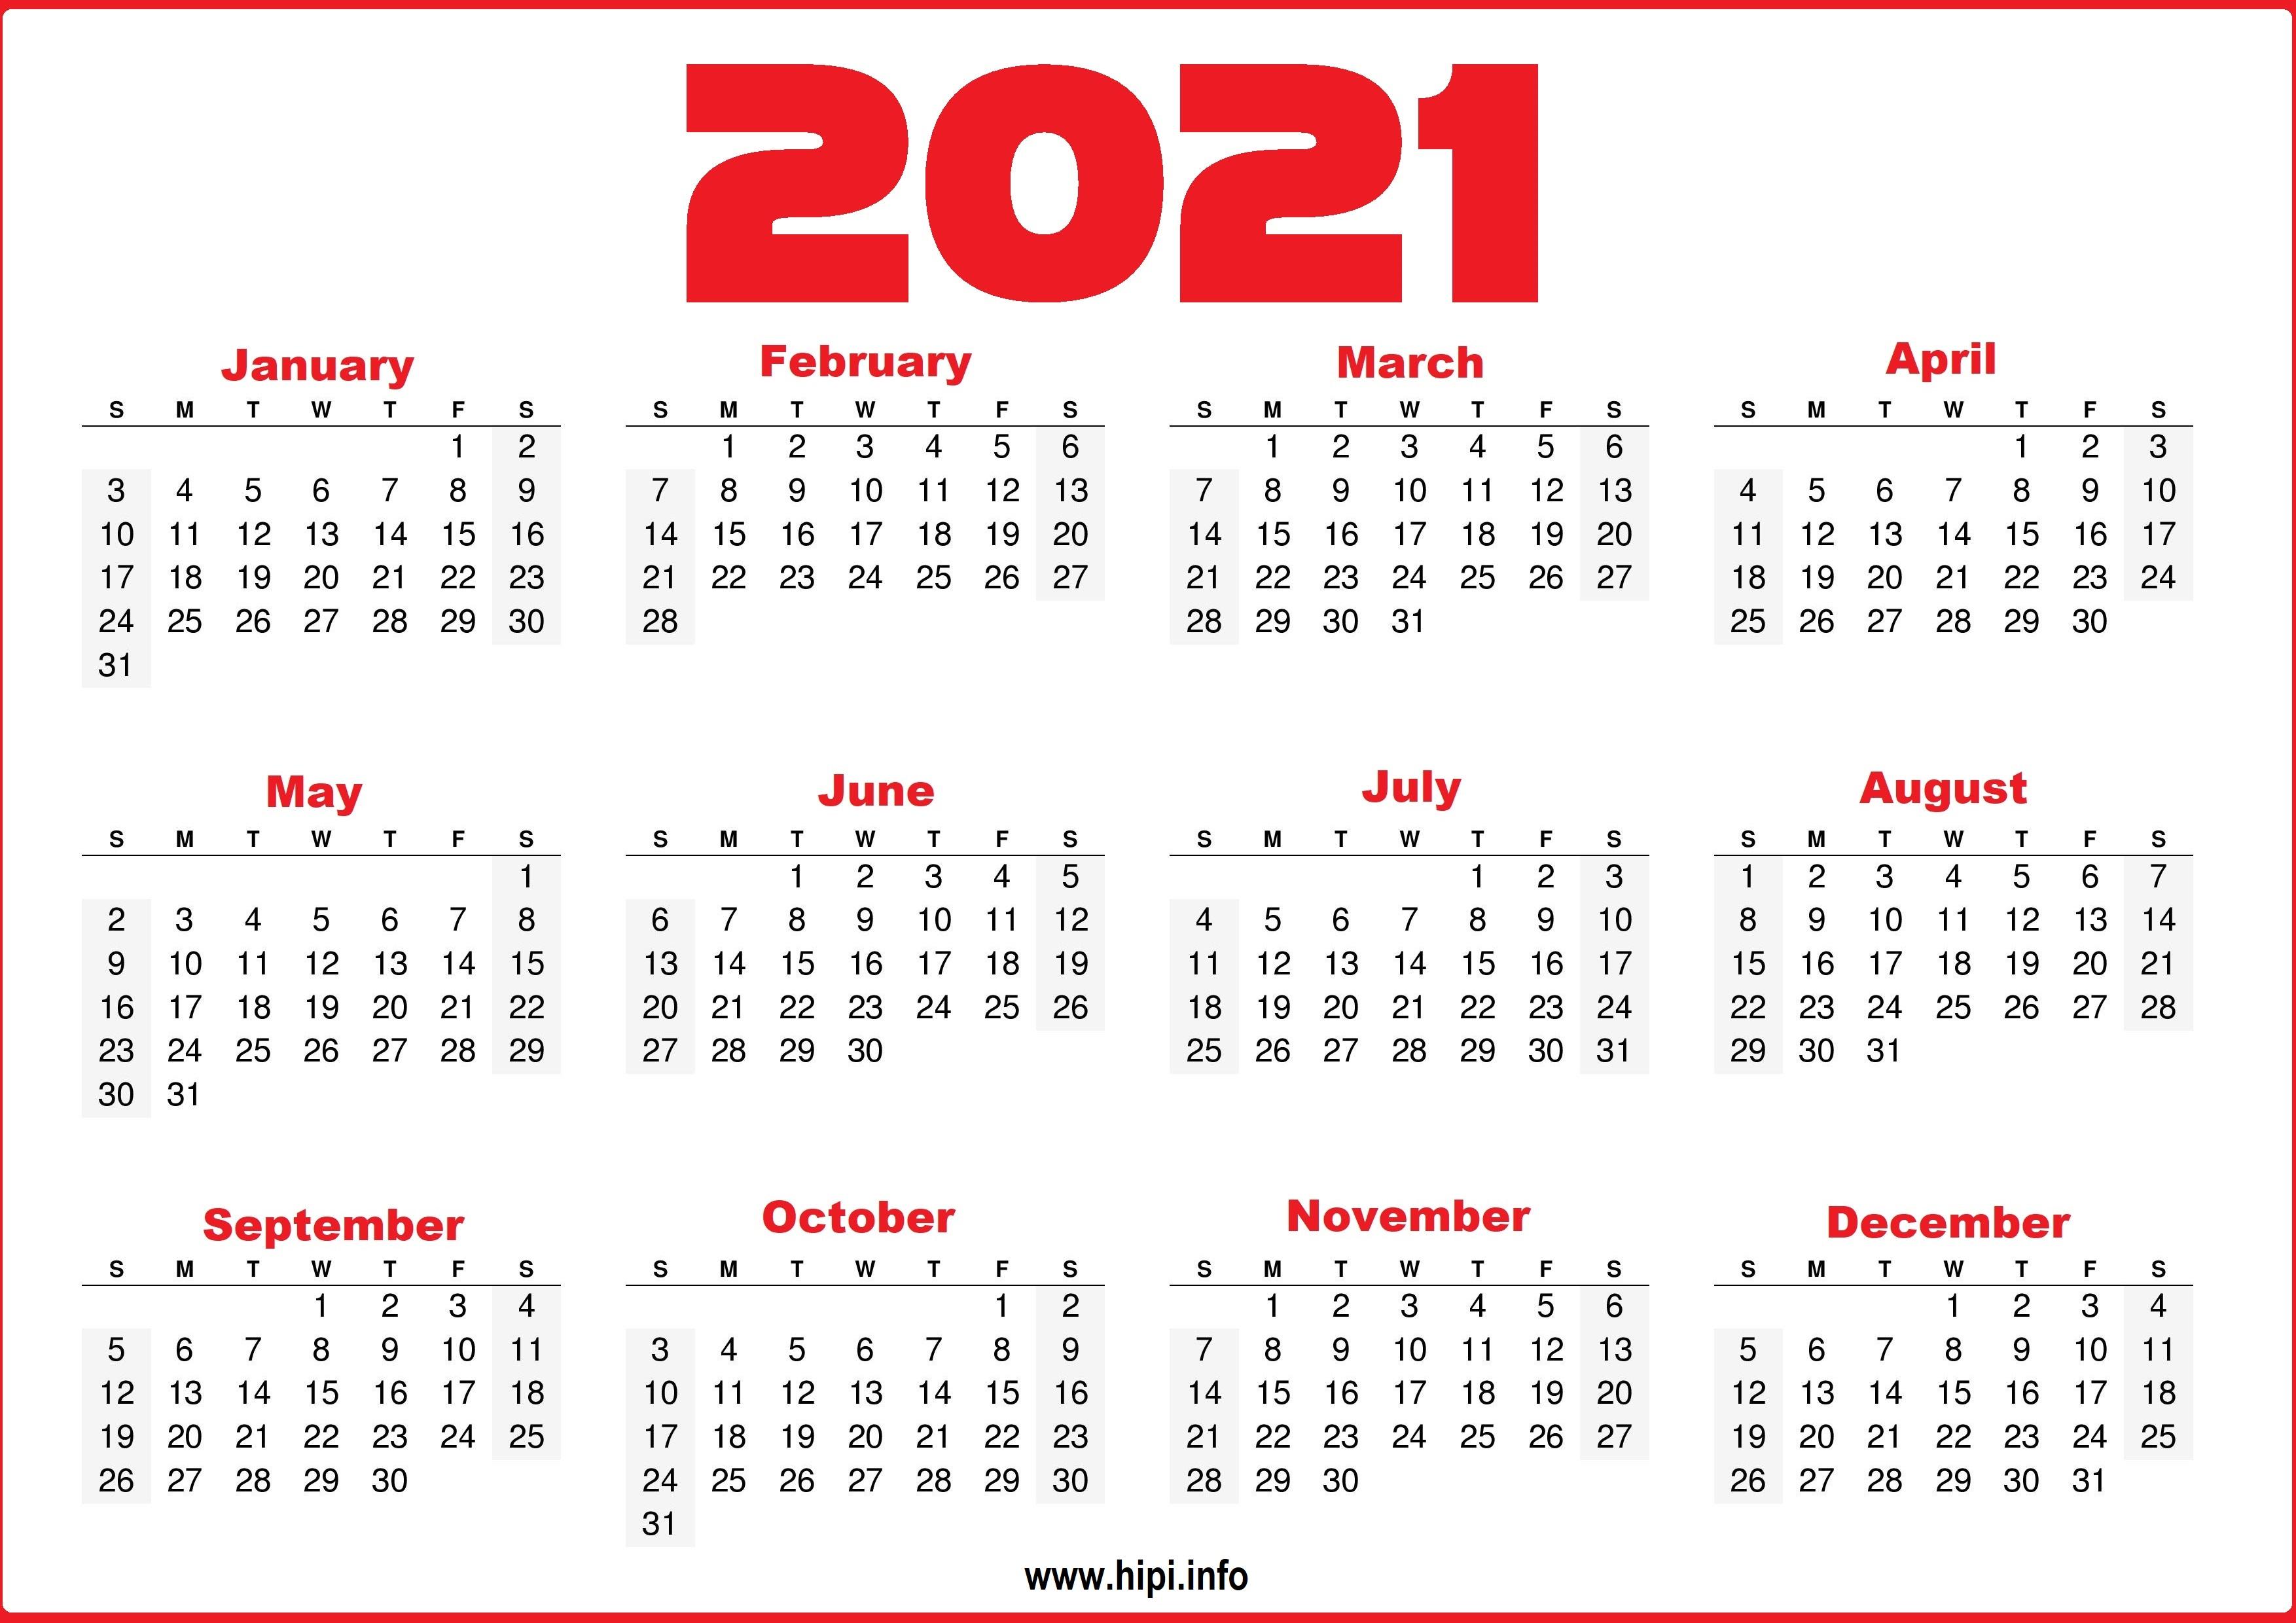 2021 Printable Yearly Calendar Free - Hipi.info